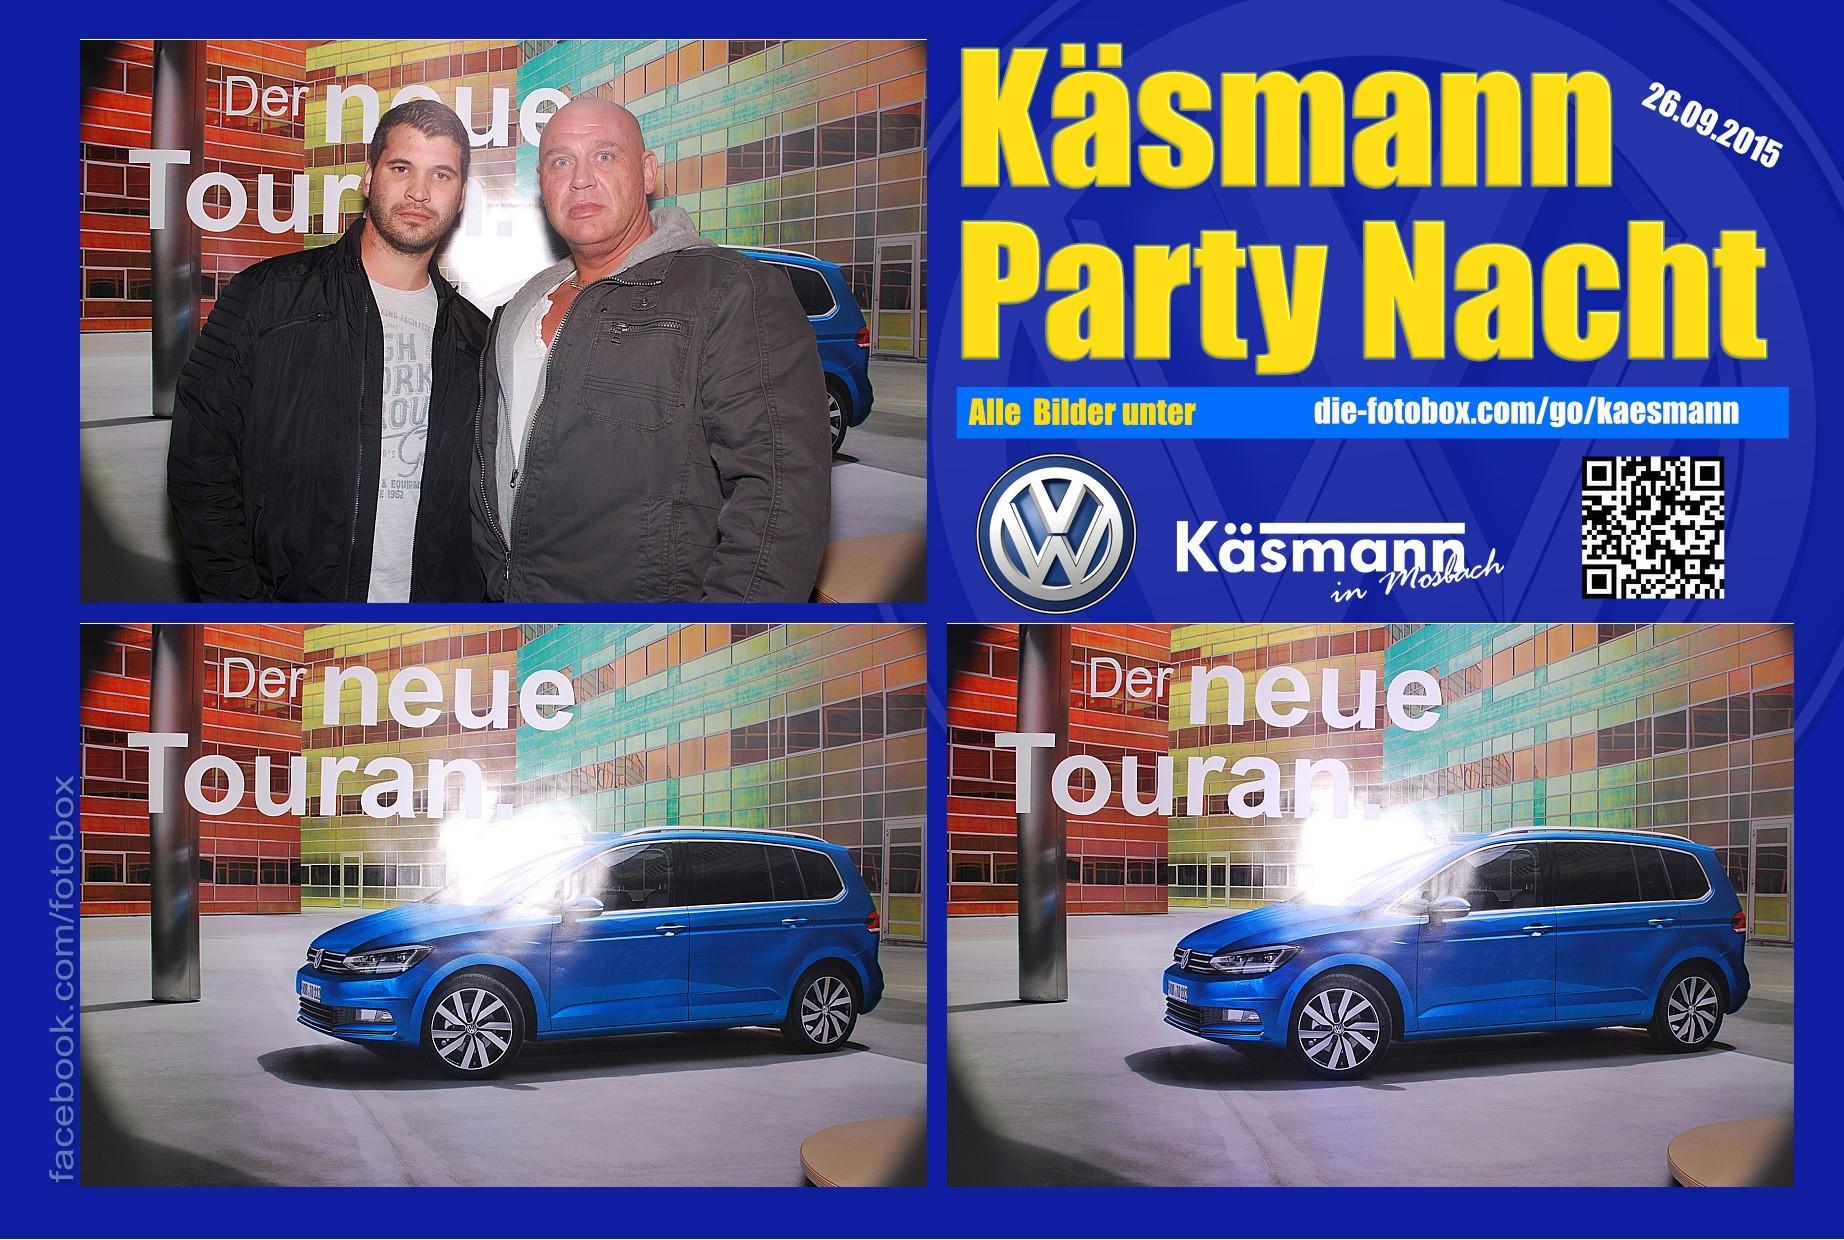 Käsmannparty 2015 - www.die-fotobox.com 01240